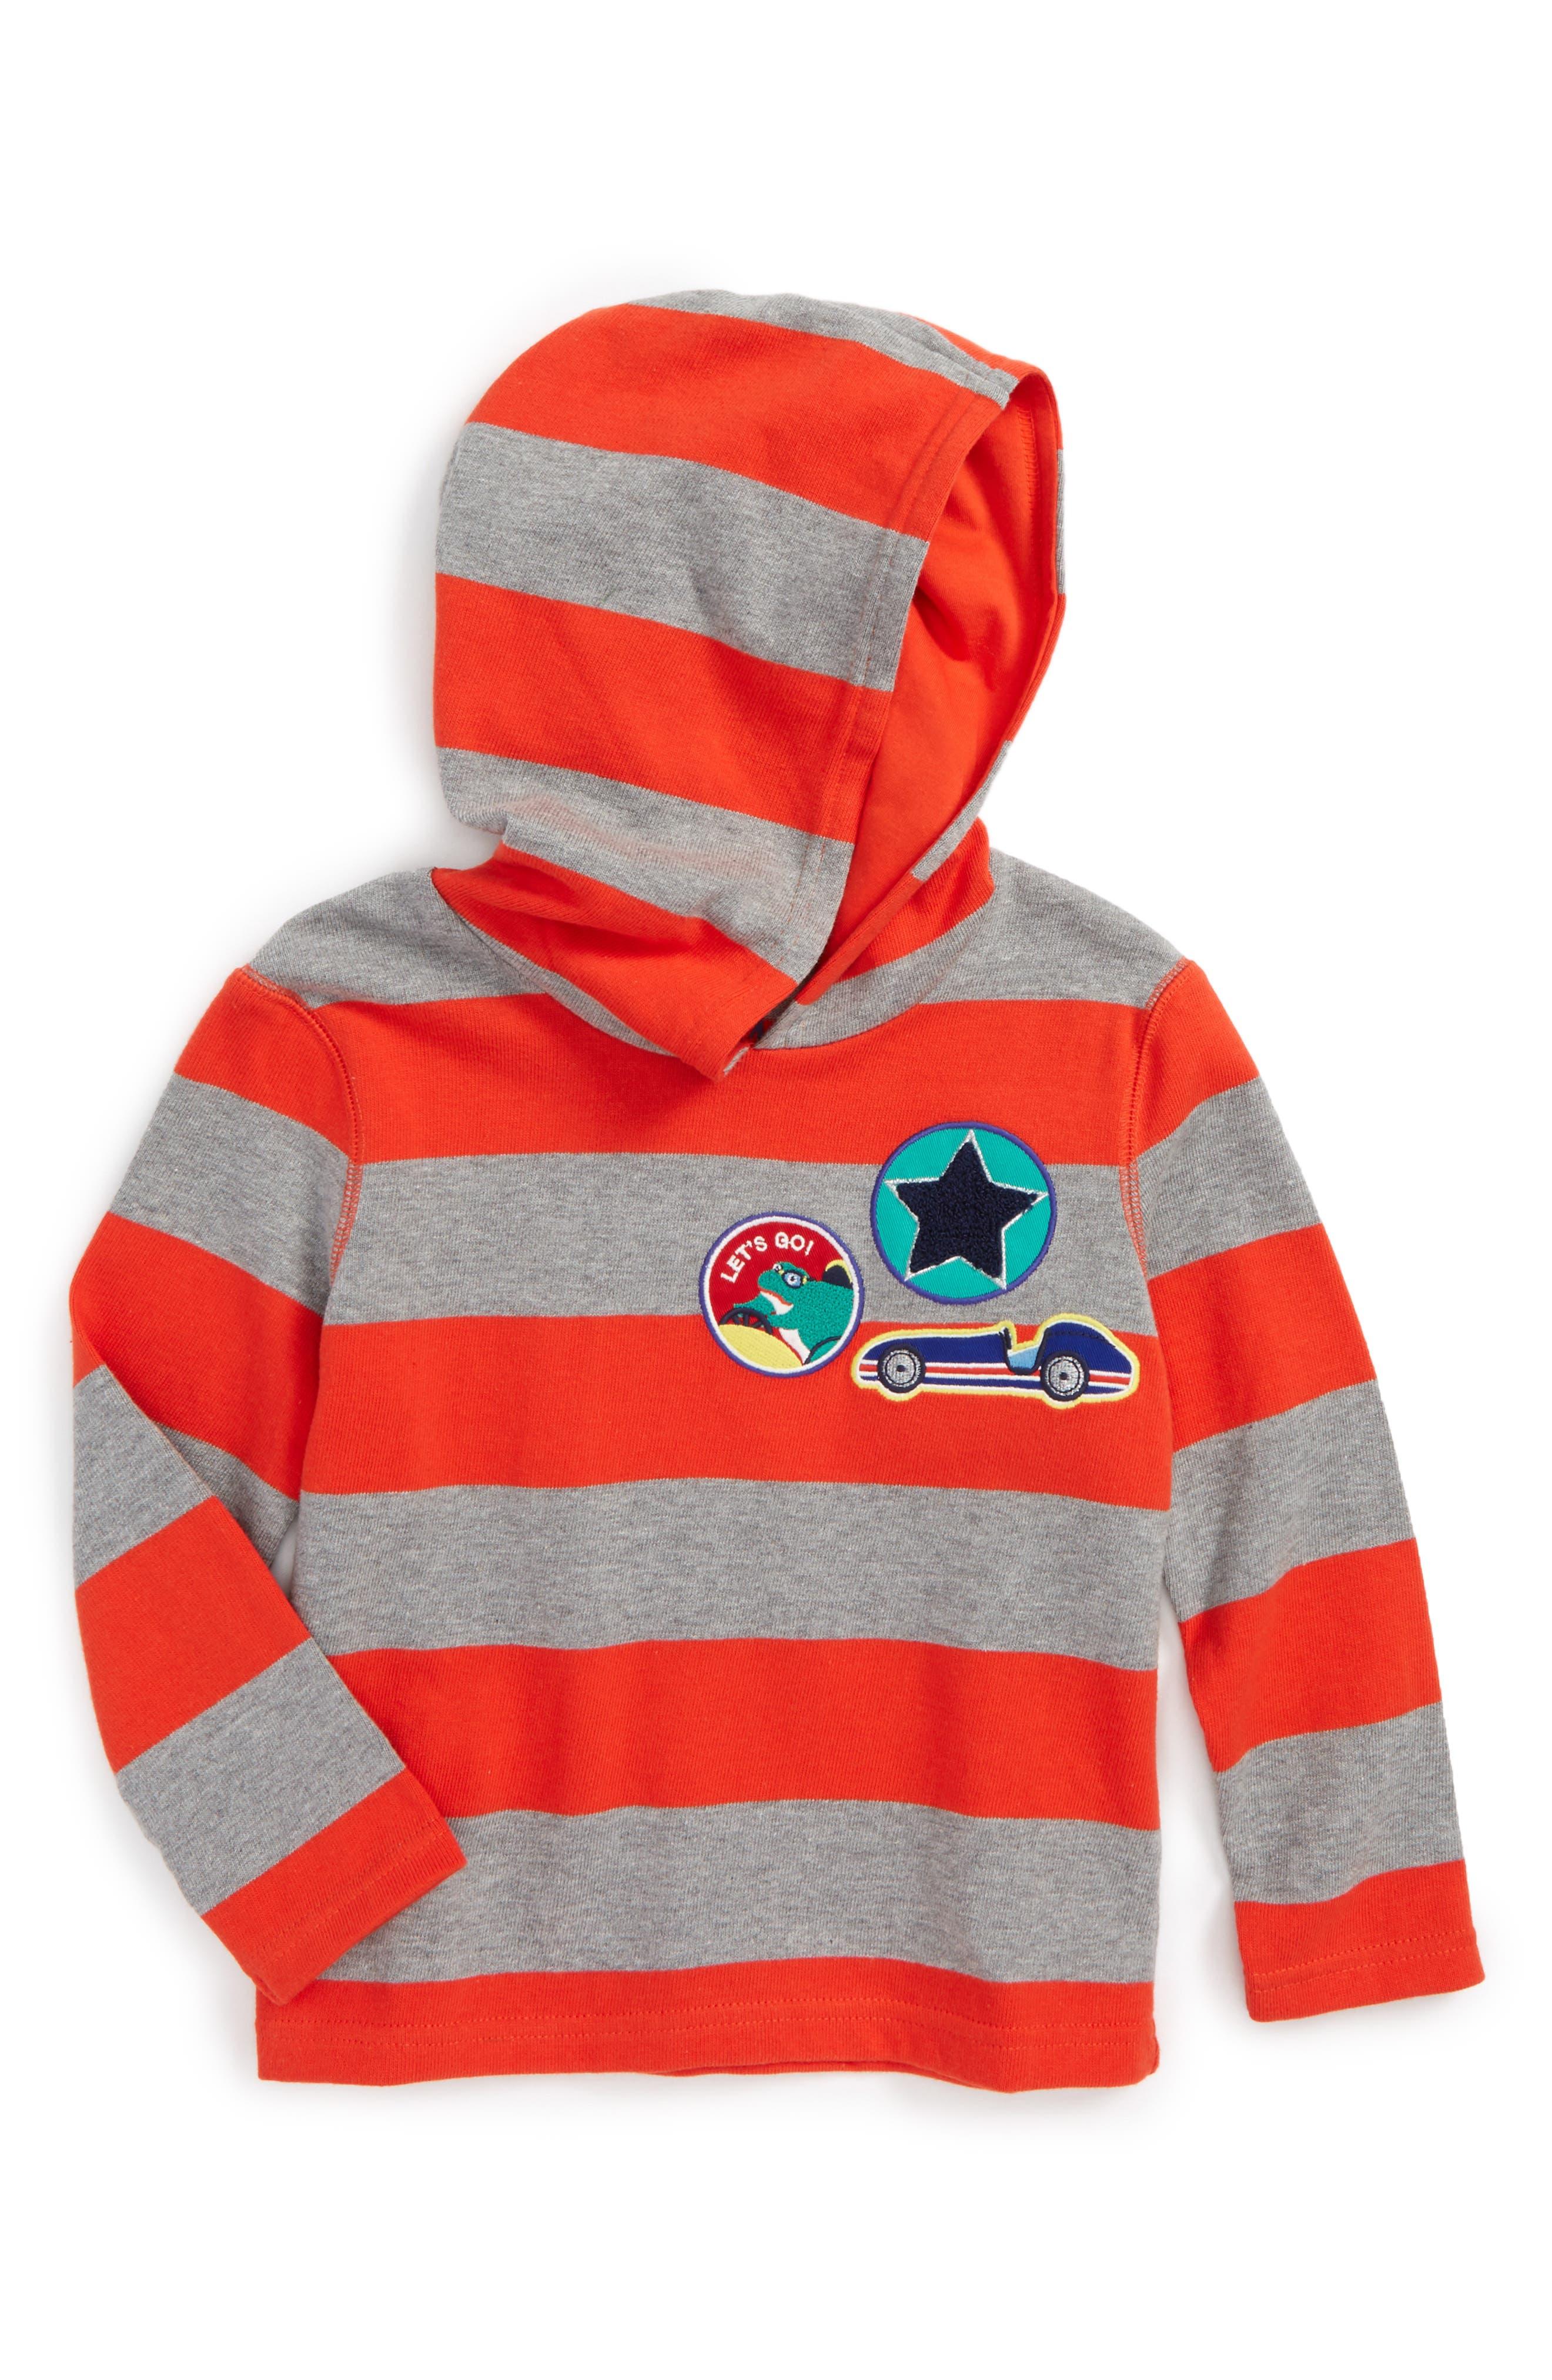 Main Image - Mini Boden Stripy Patch Hoodie (Toddler Boys, Little Boys & Big Boys)